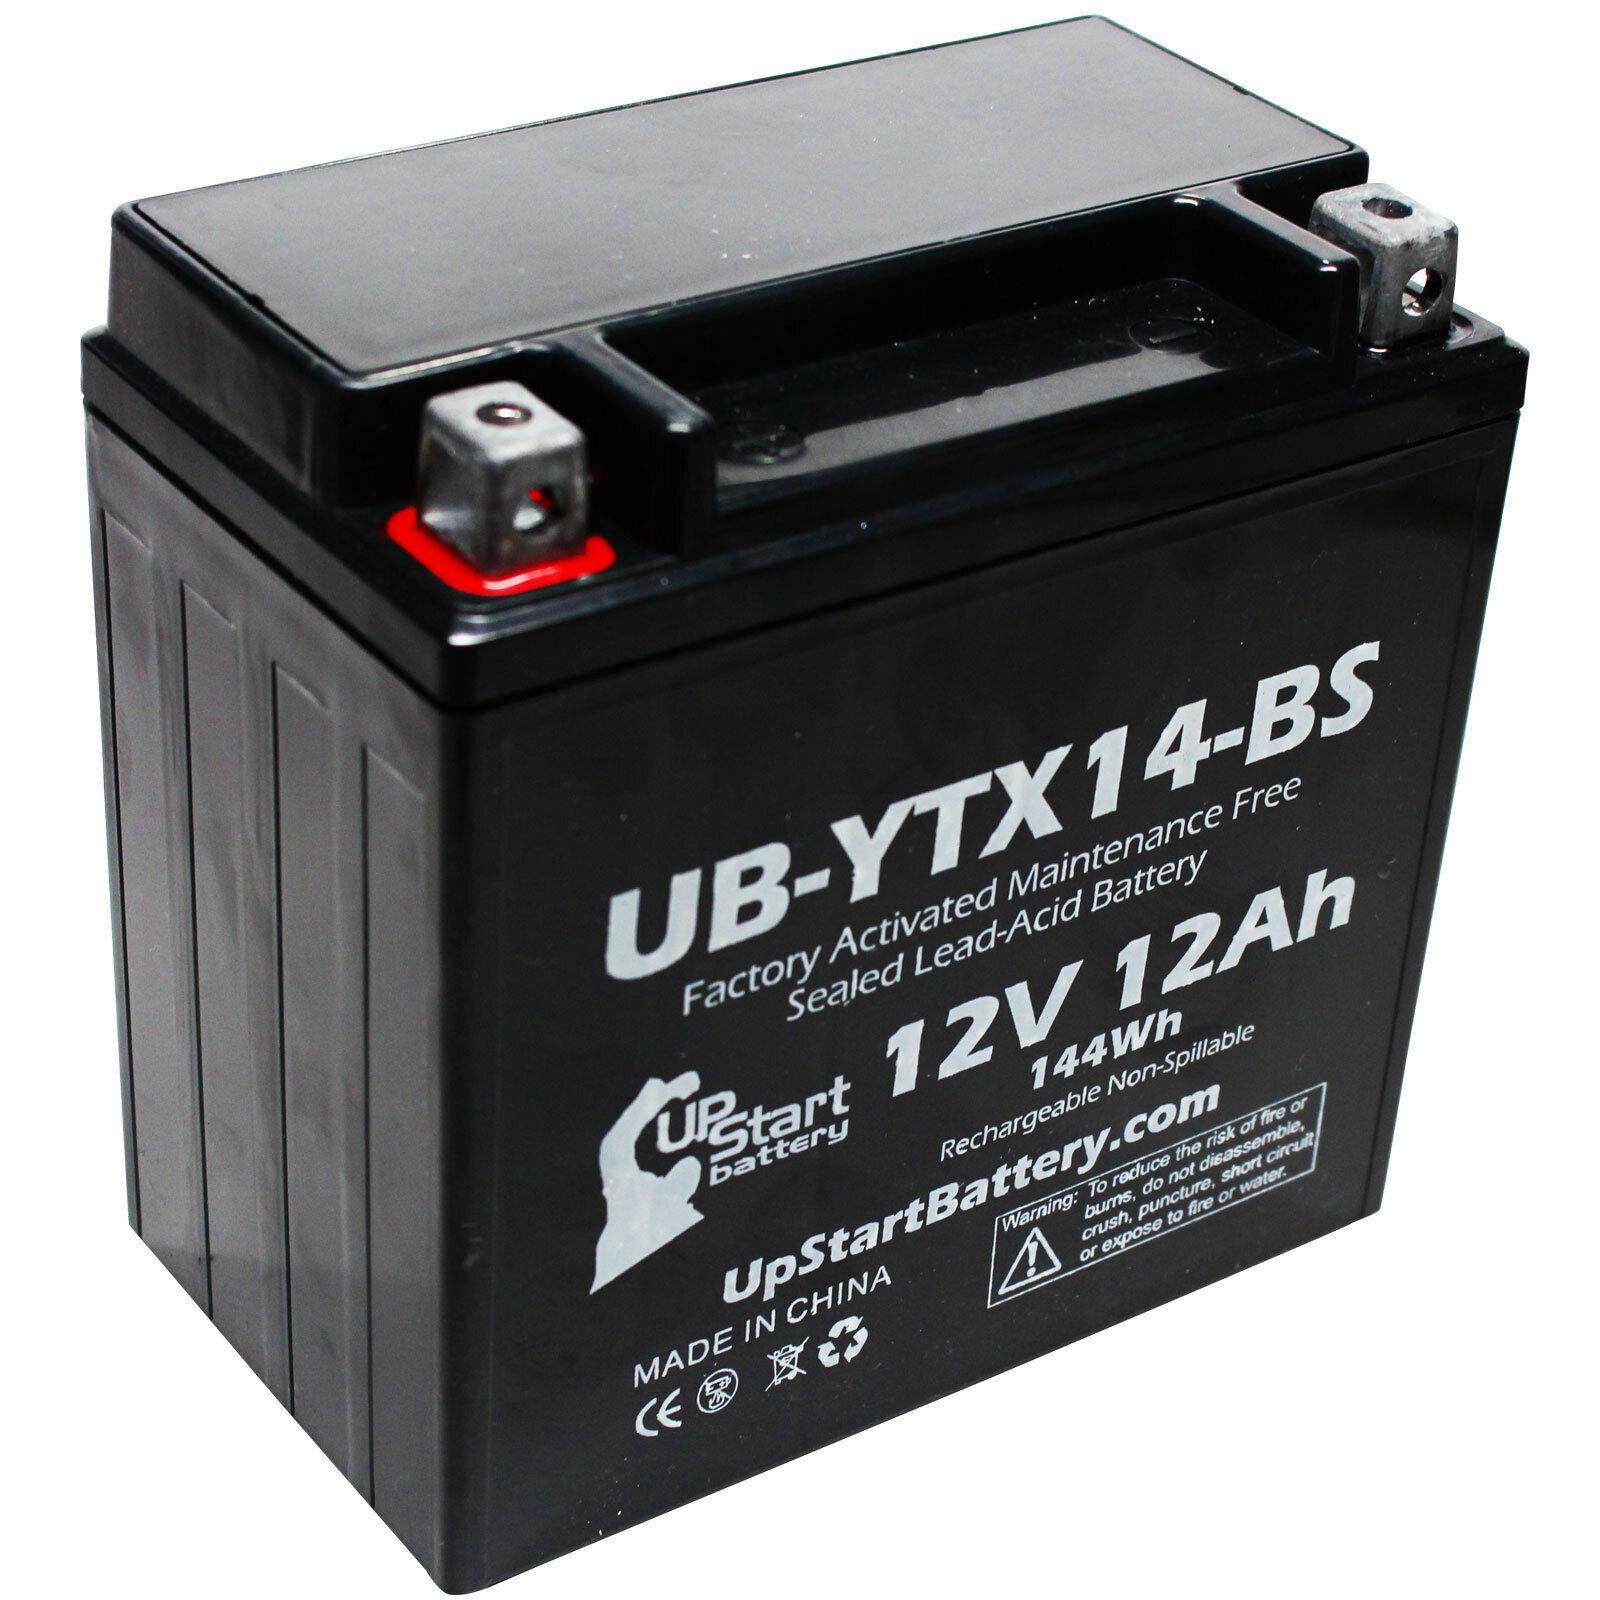 12V 12AH Battery for 2004 Honda TRX500FA Fourtrax Rubicon 450 CC